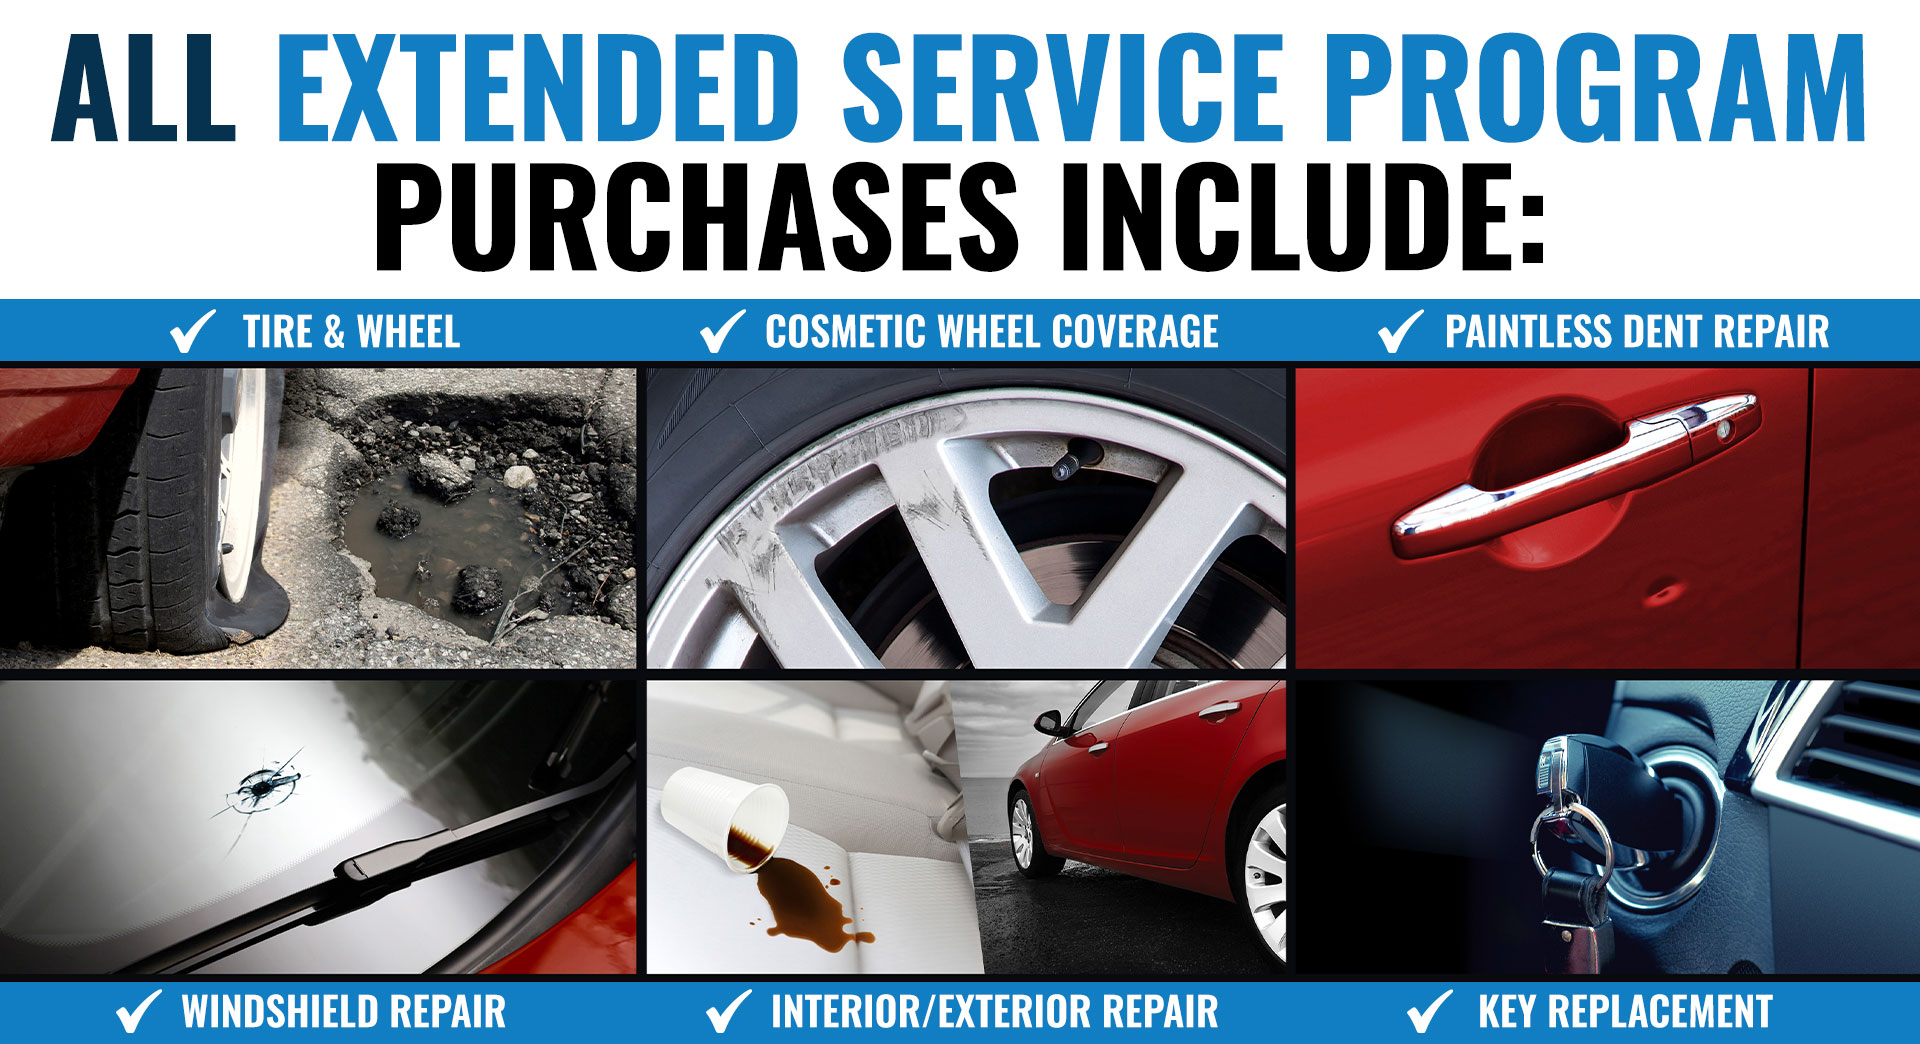 All extended service program